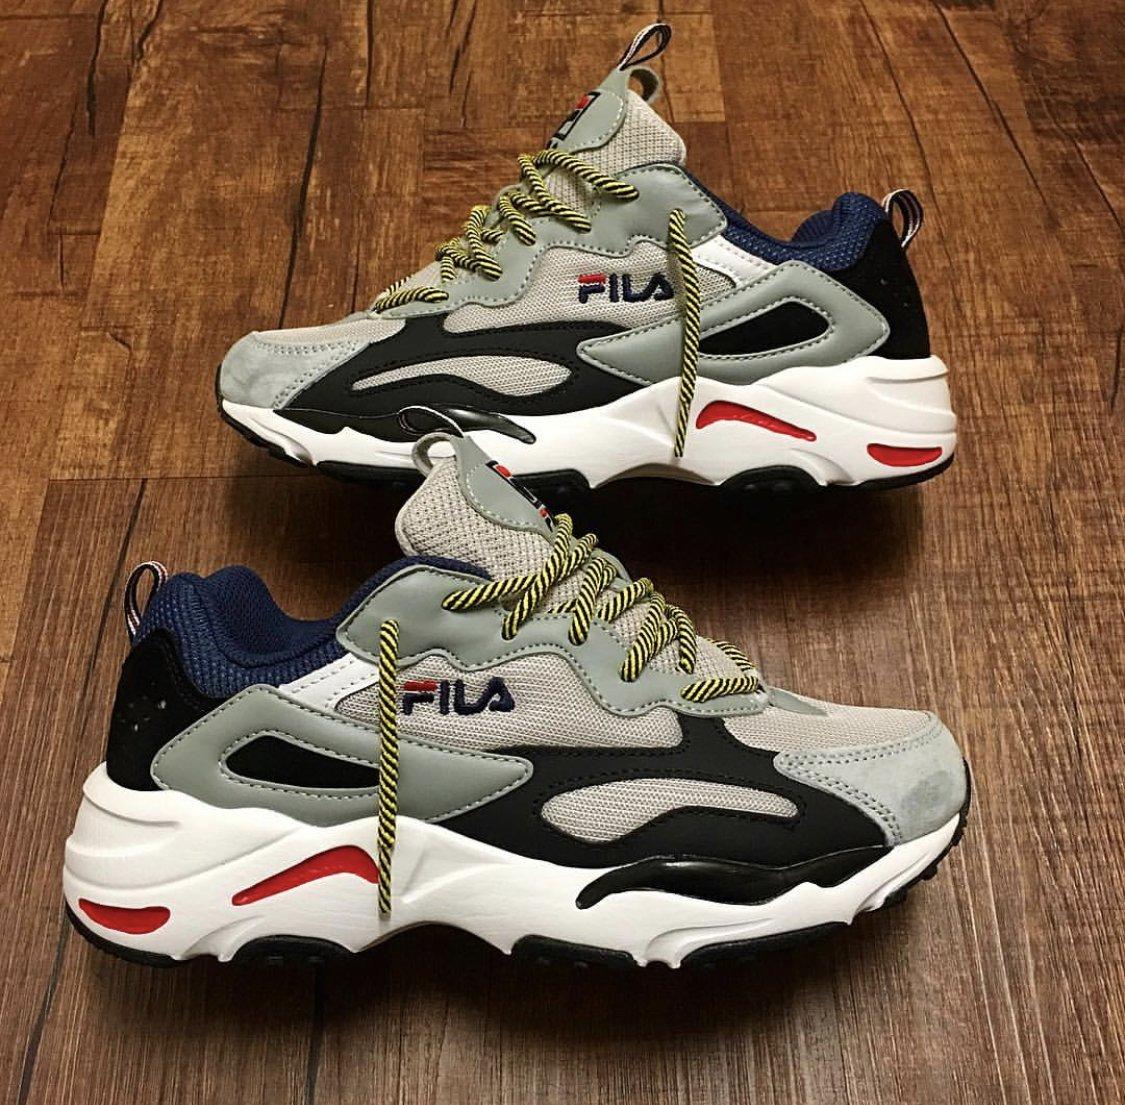 fila waverunner Shop Clothing \u0026 Shoes